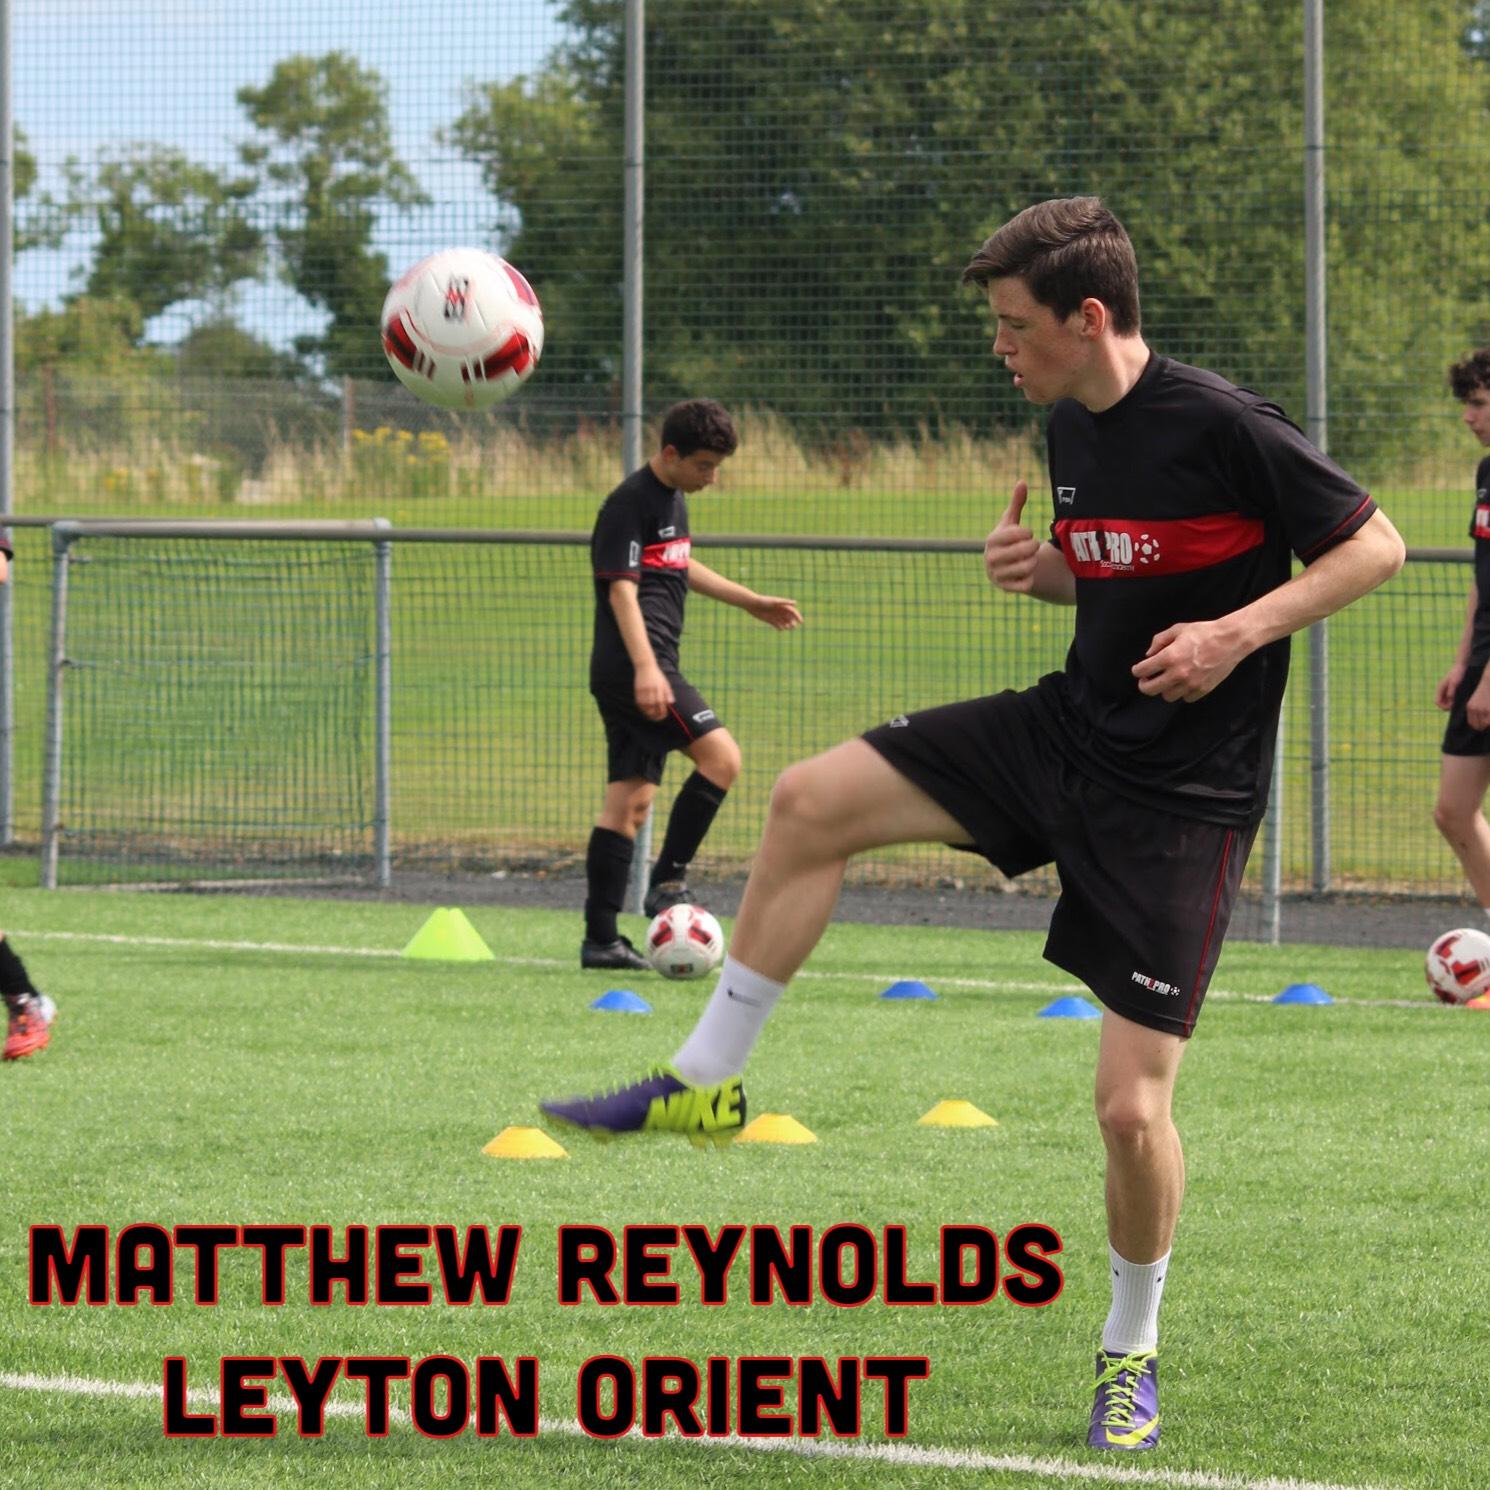 Matthew Reynolds